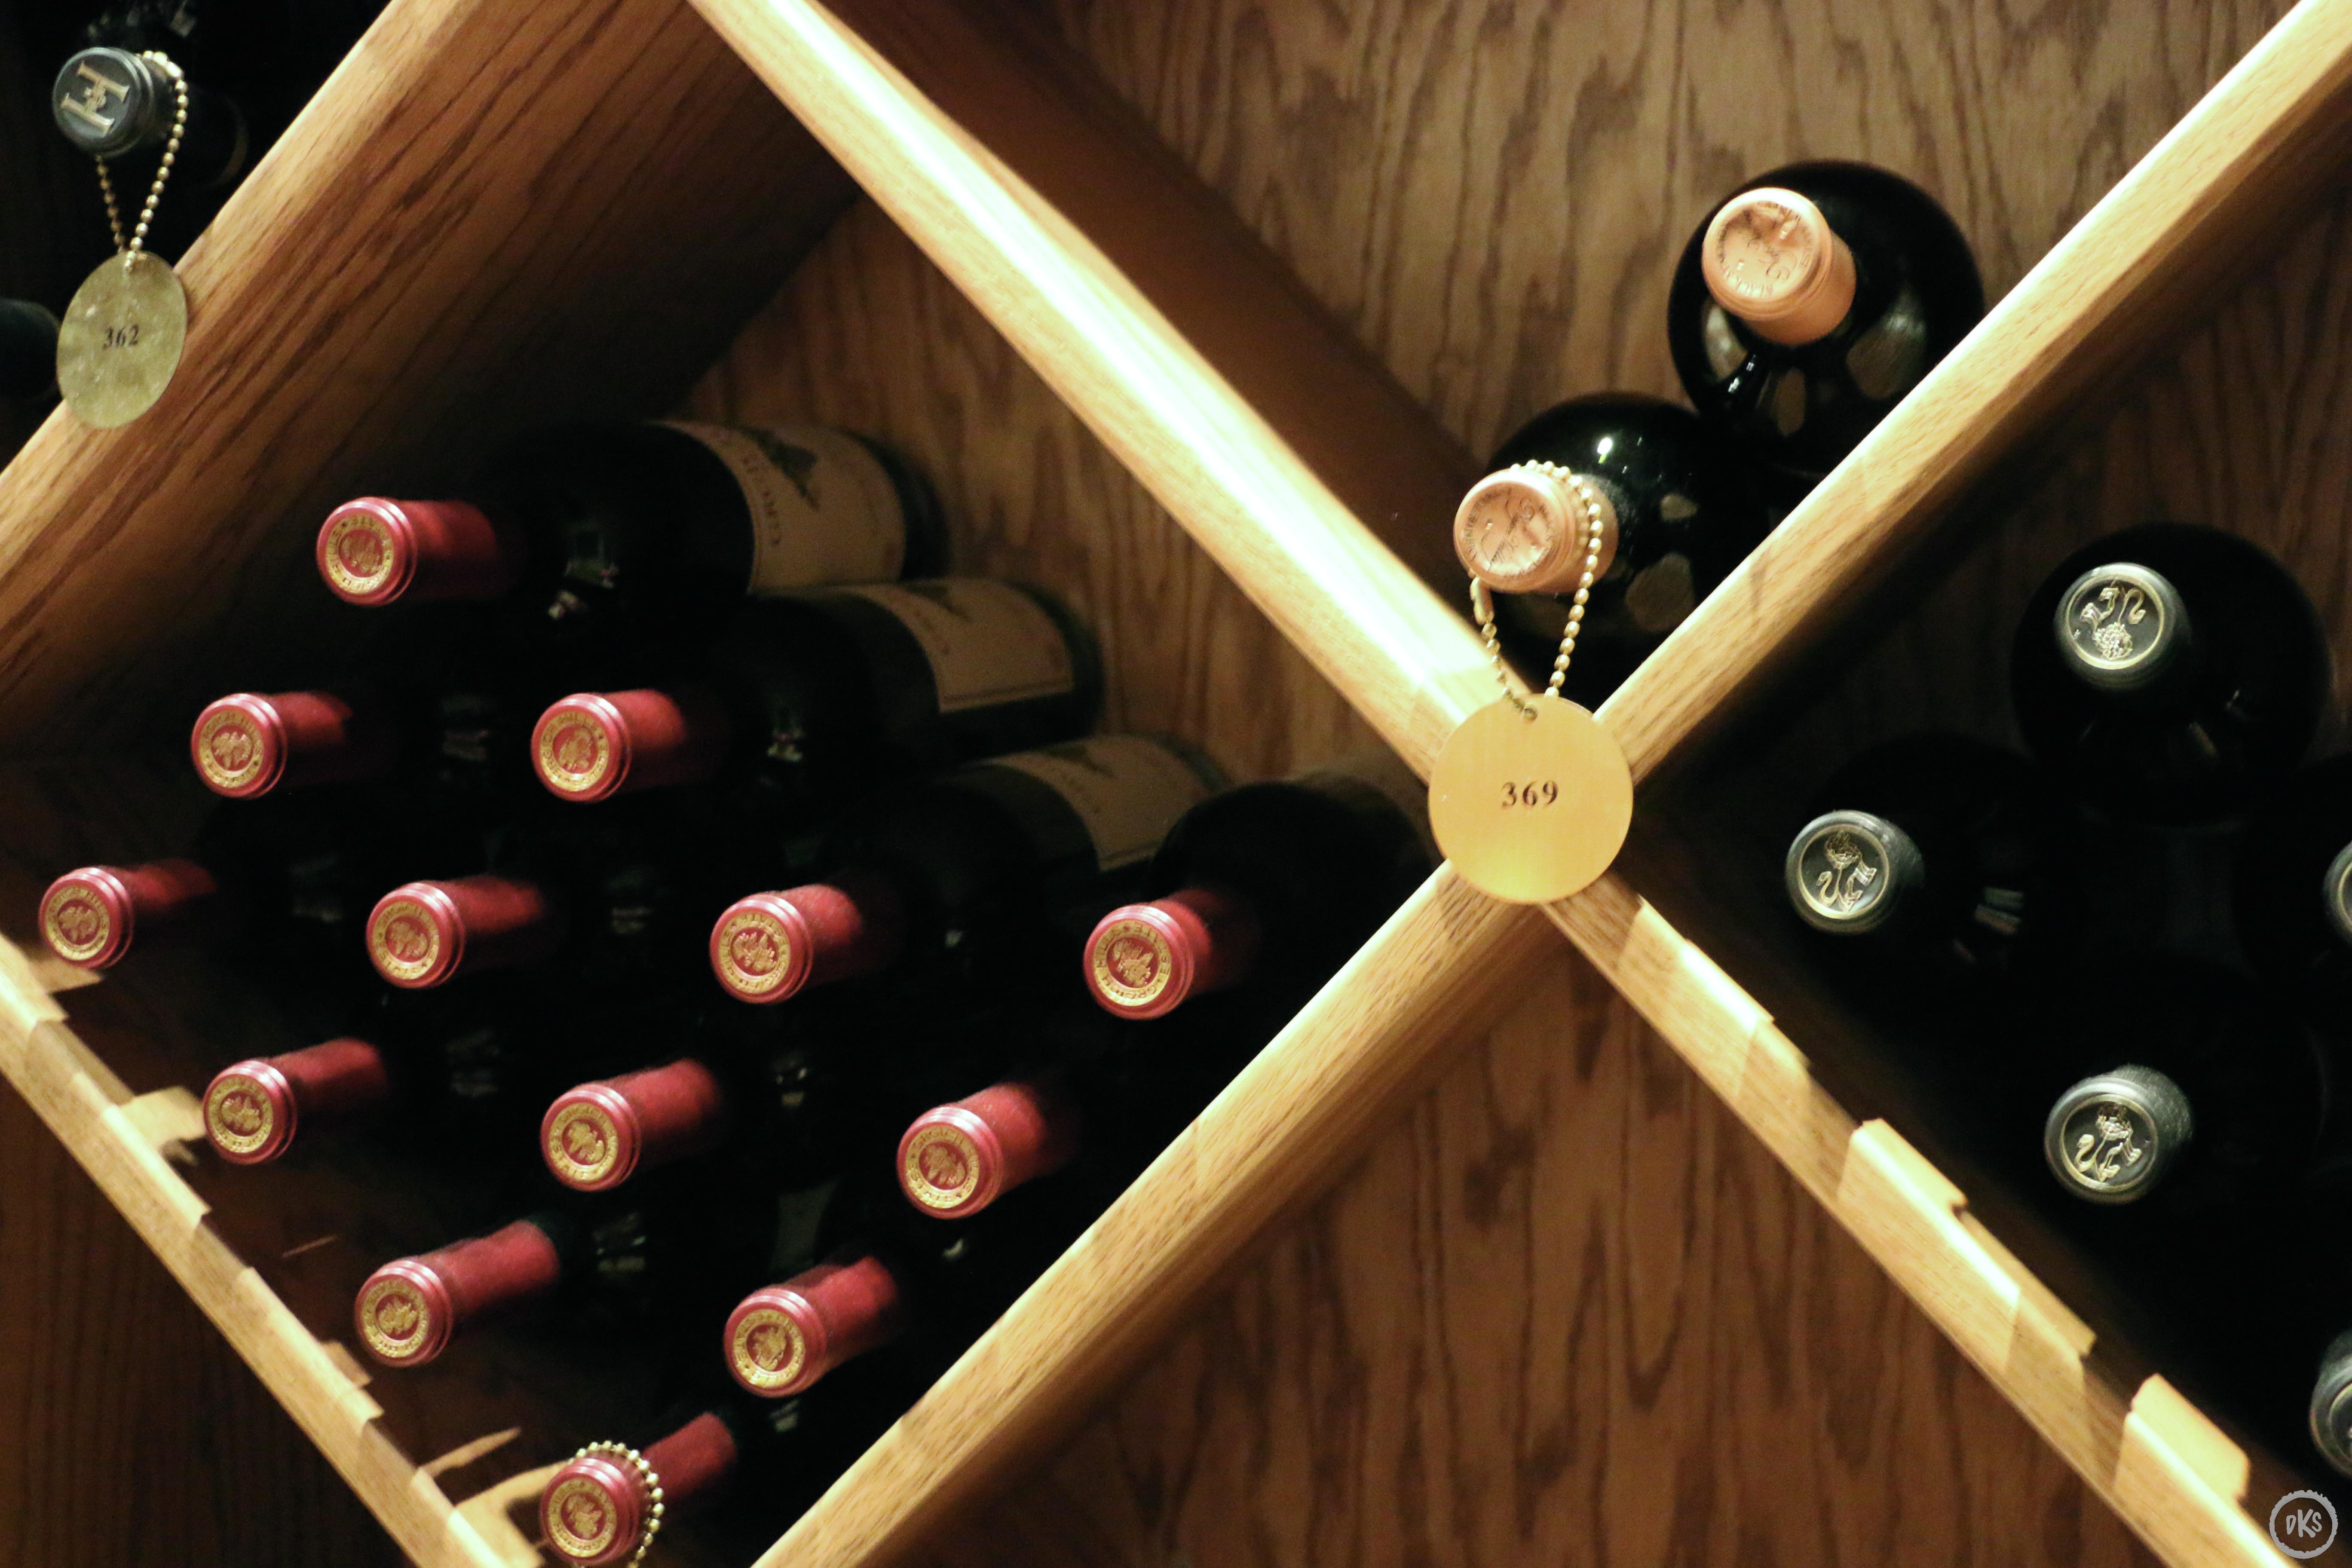 HHC Wine Cellar